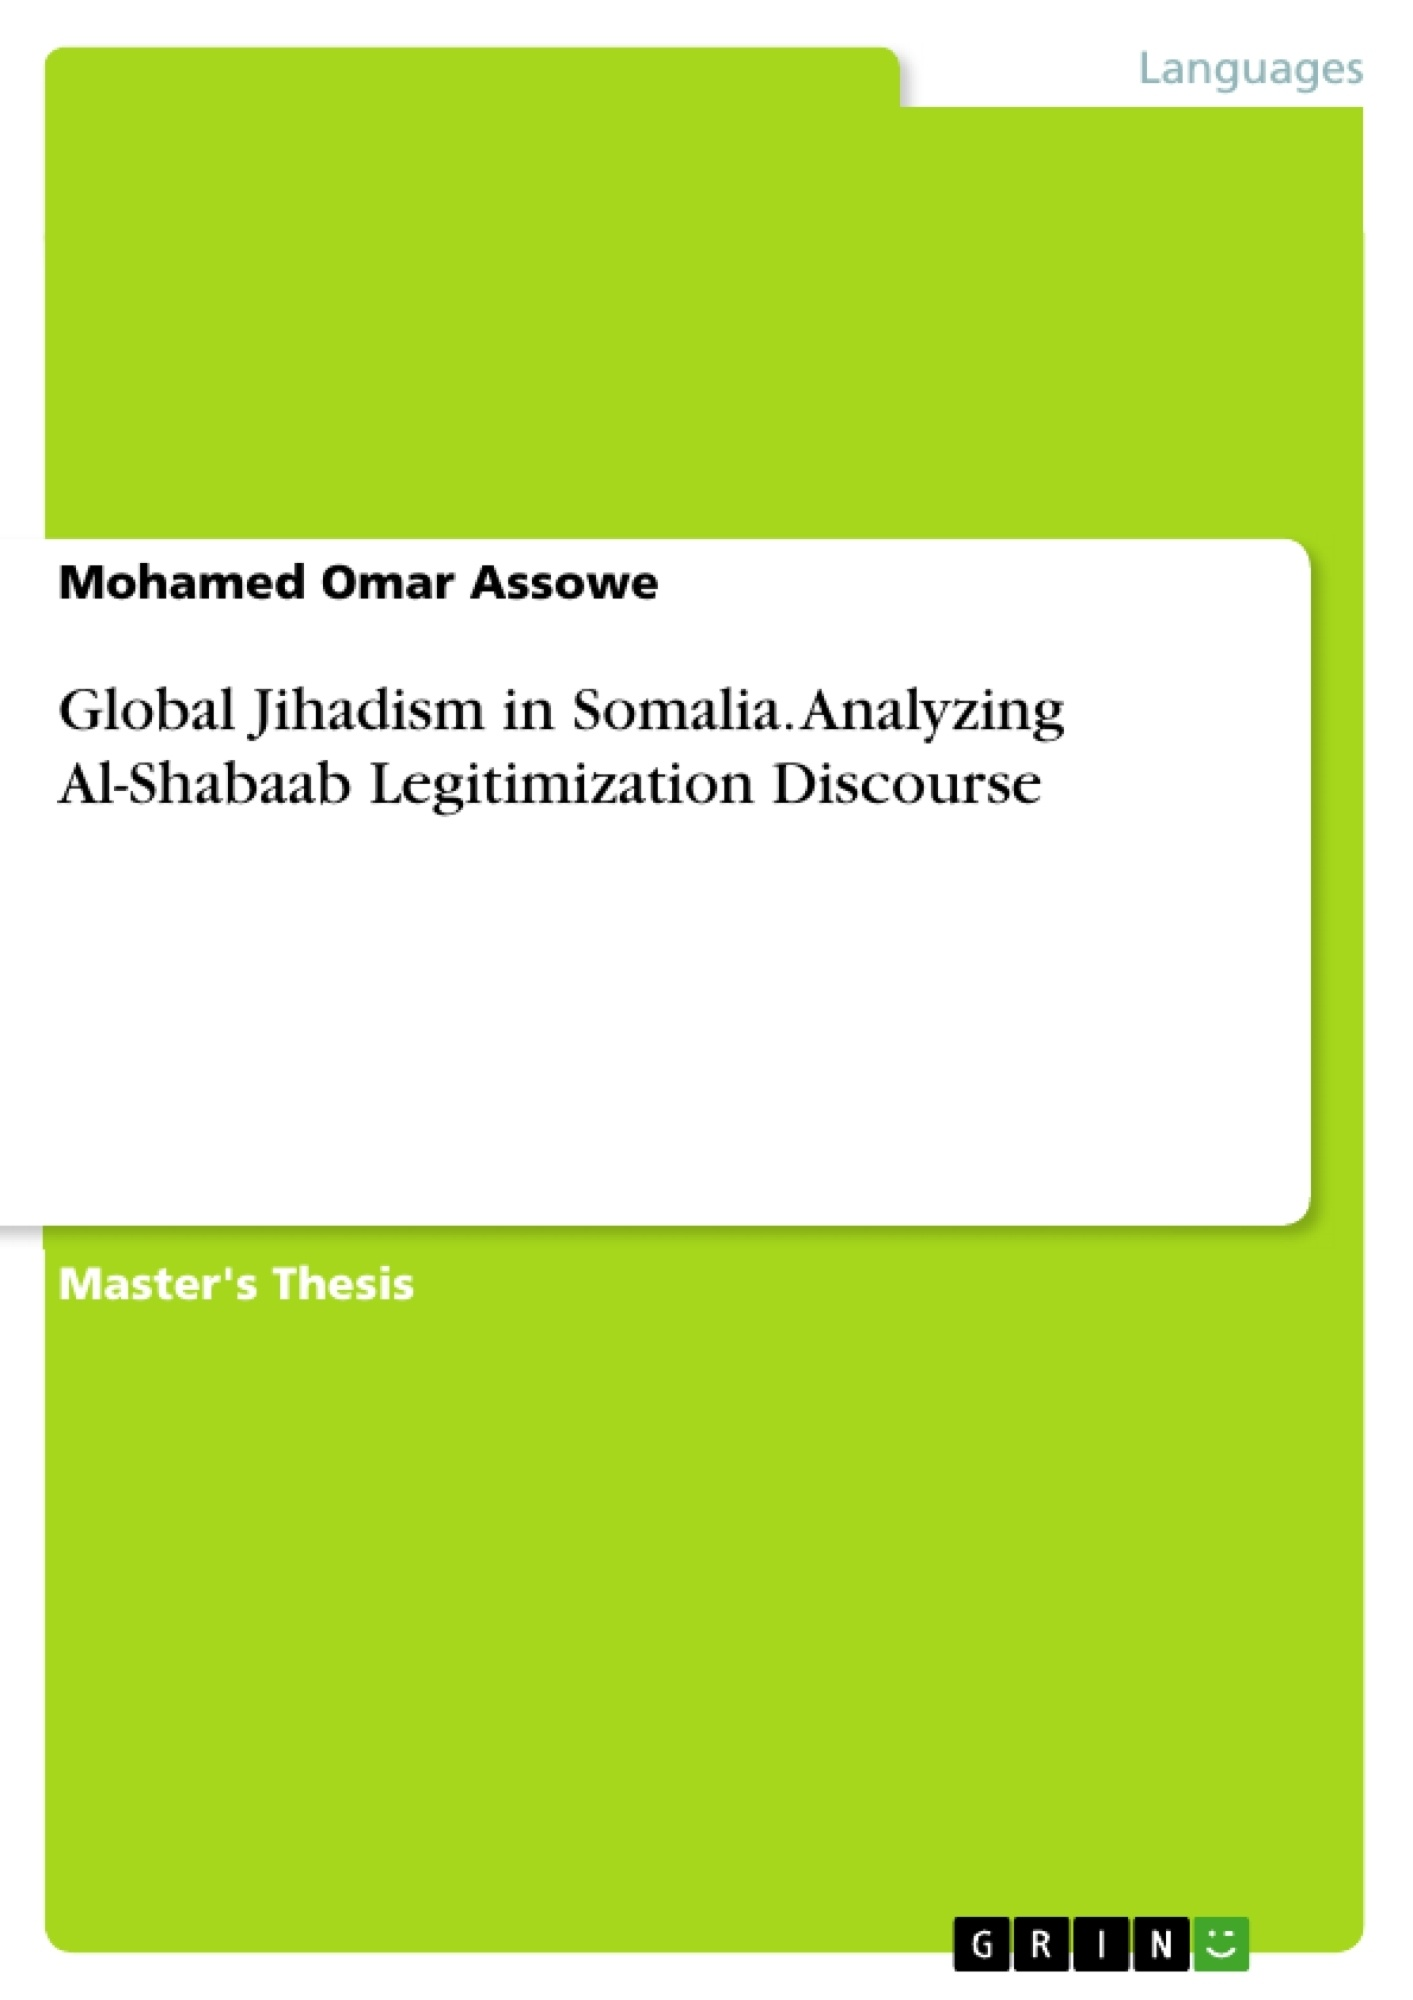 Title: Global Jihadism in Somalia. Analyzing Al-Shabaab Legitimization Discourse